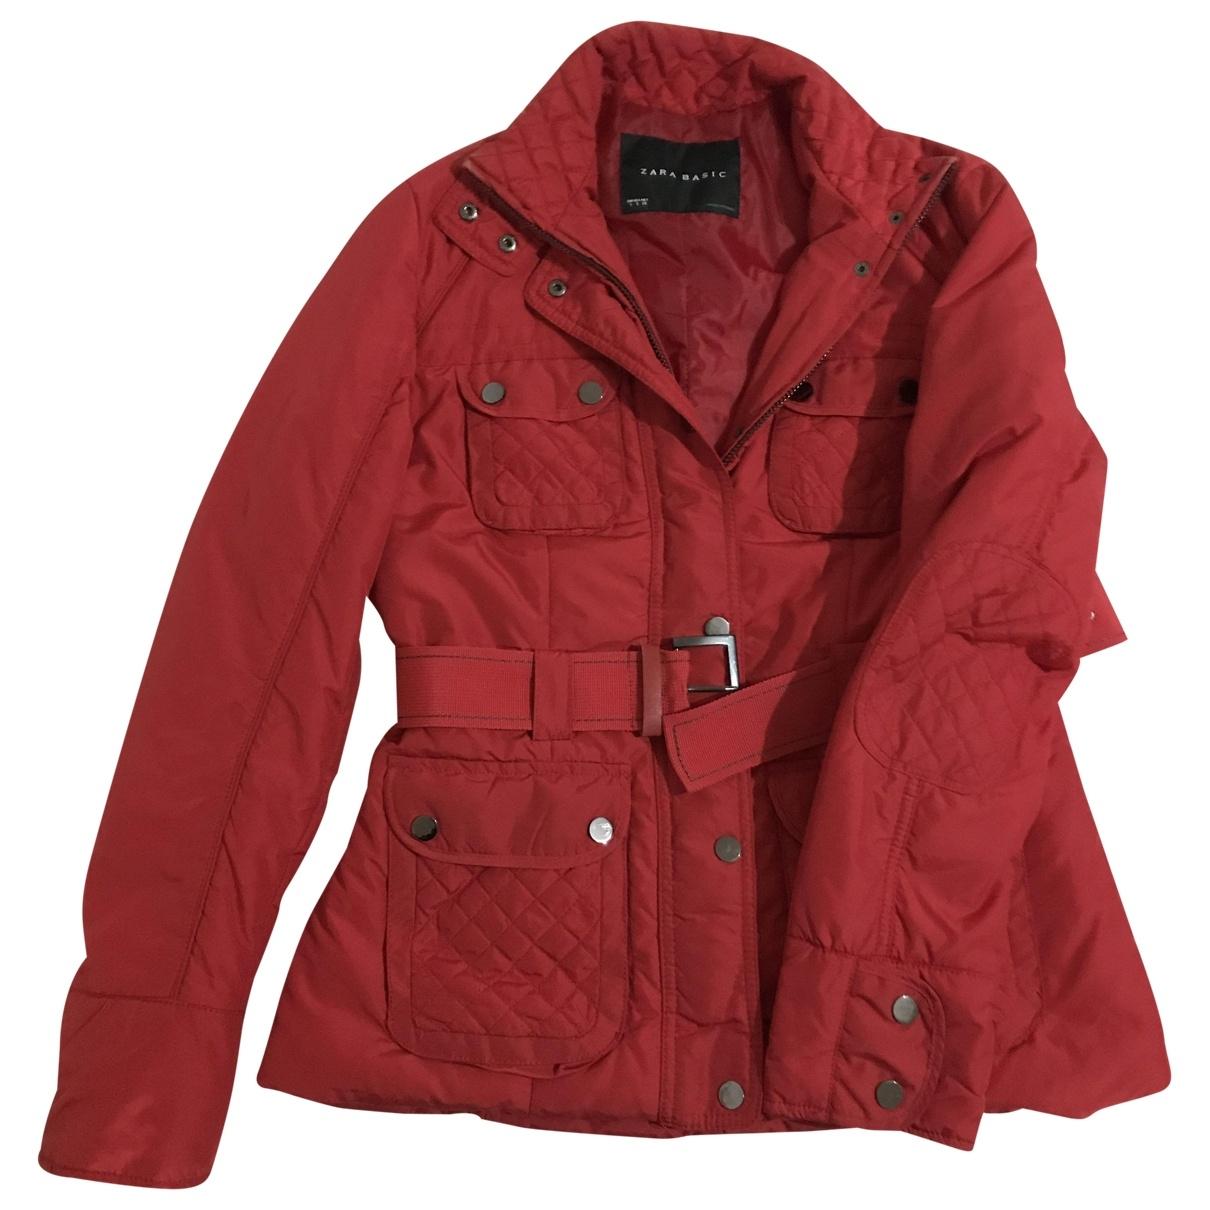 Zara \N Lederjacke in  Rot Polyester